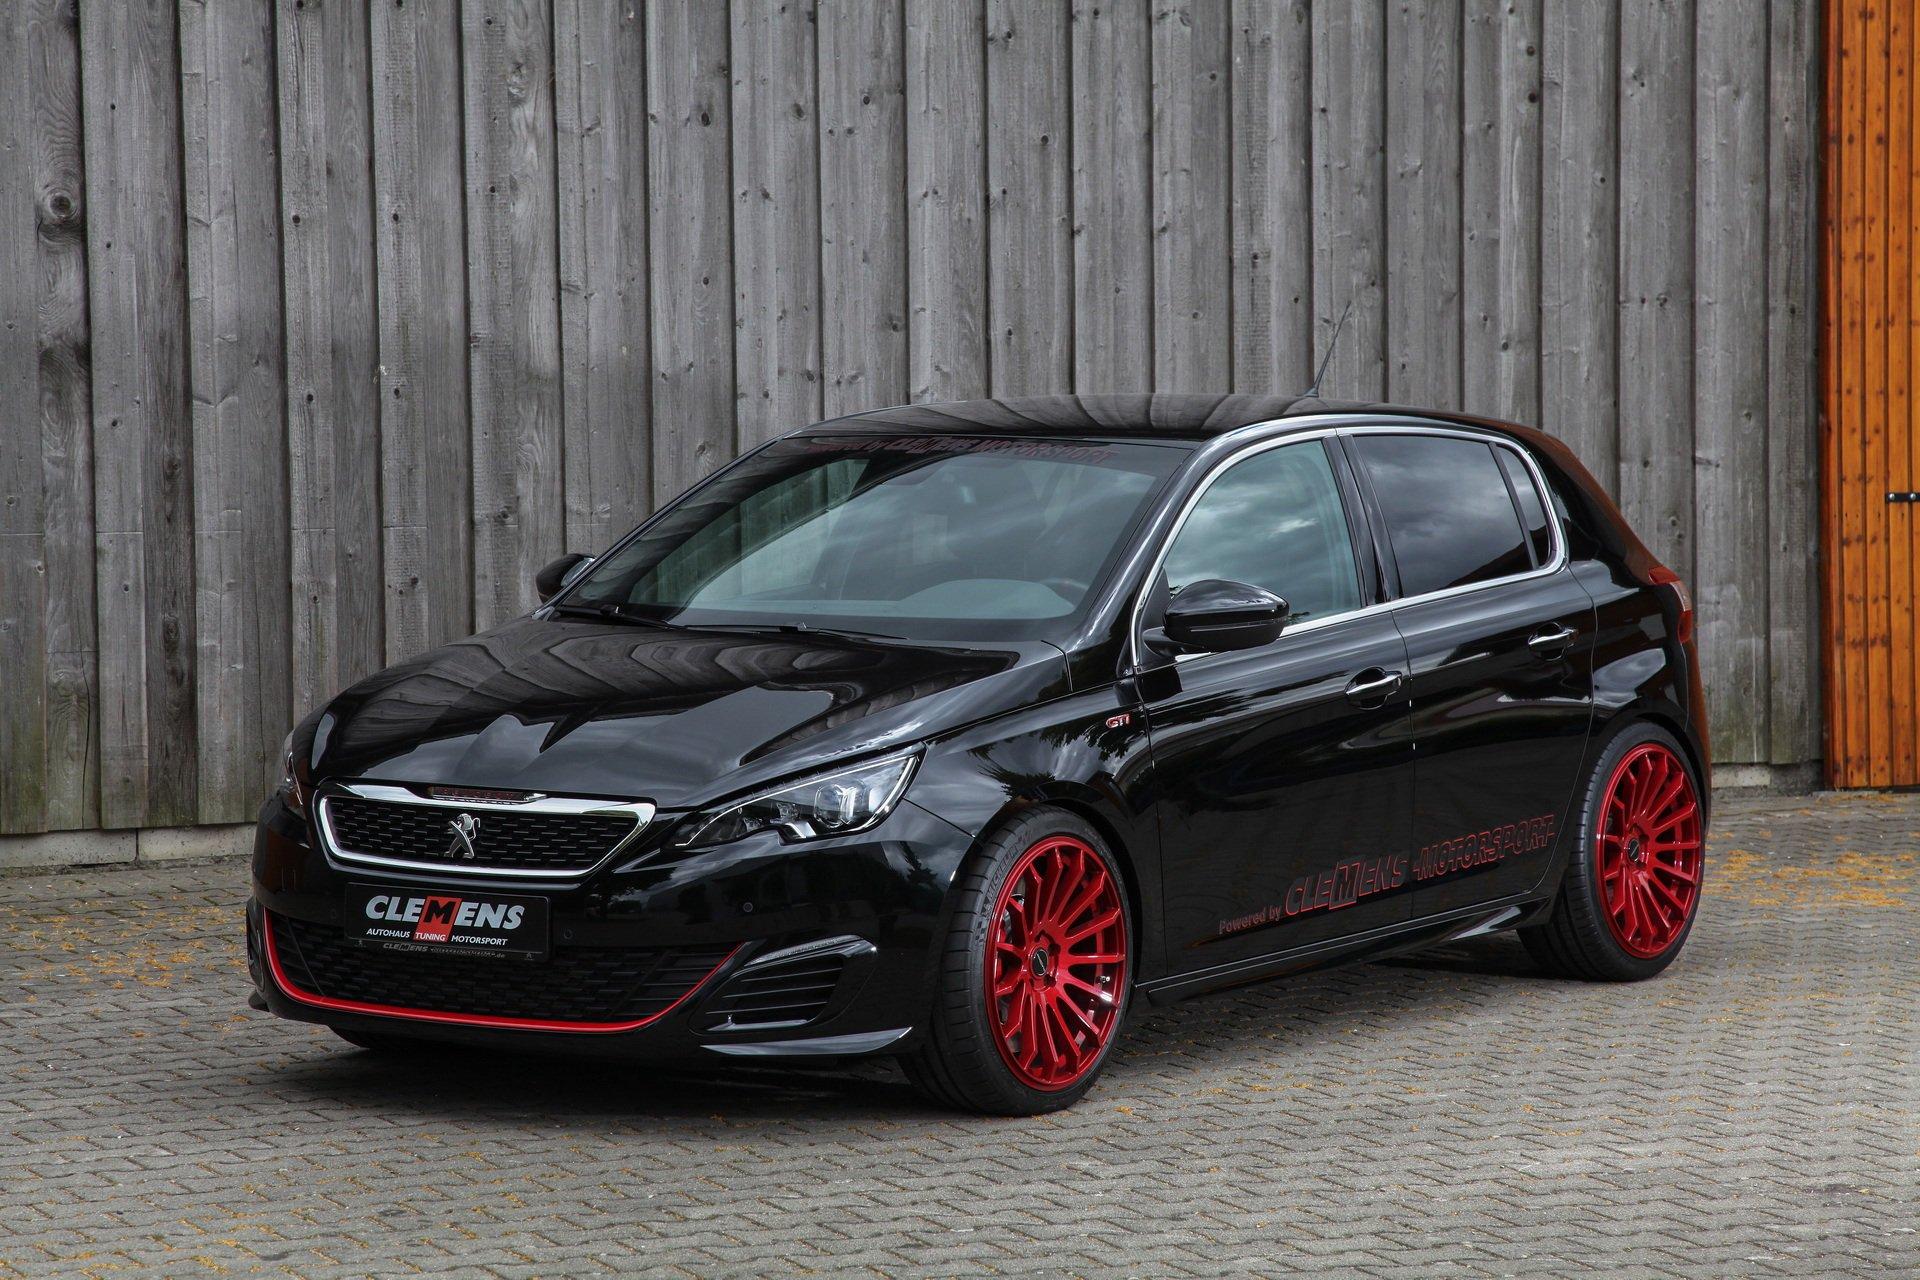 Peugeot_308_GTi_by_Clemens_Motorsport_0015